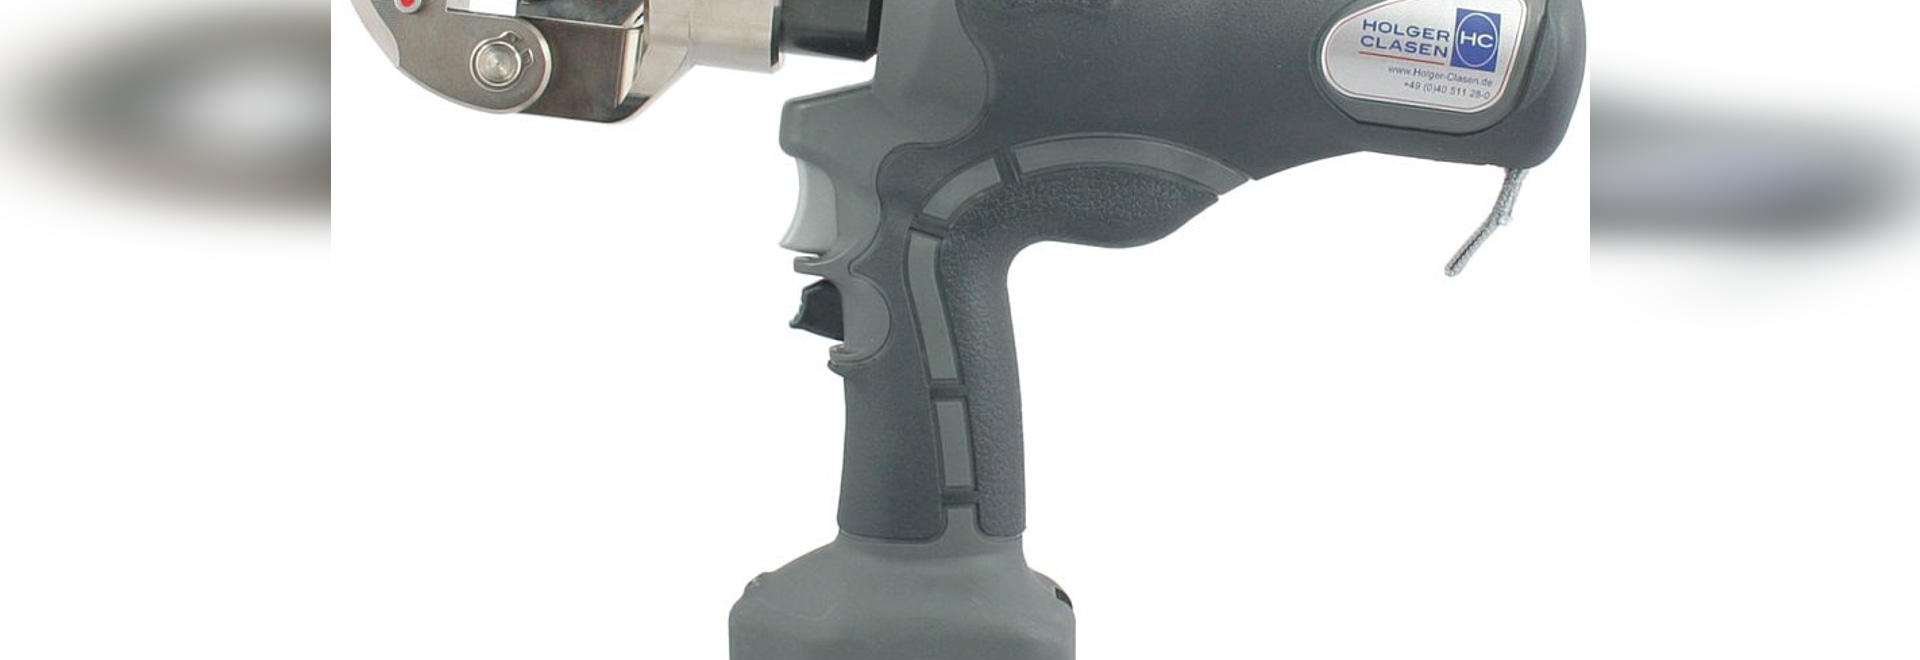 Outil à sertir hydraulique à piles de PressMax®® 10